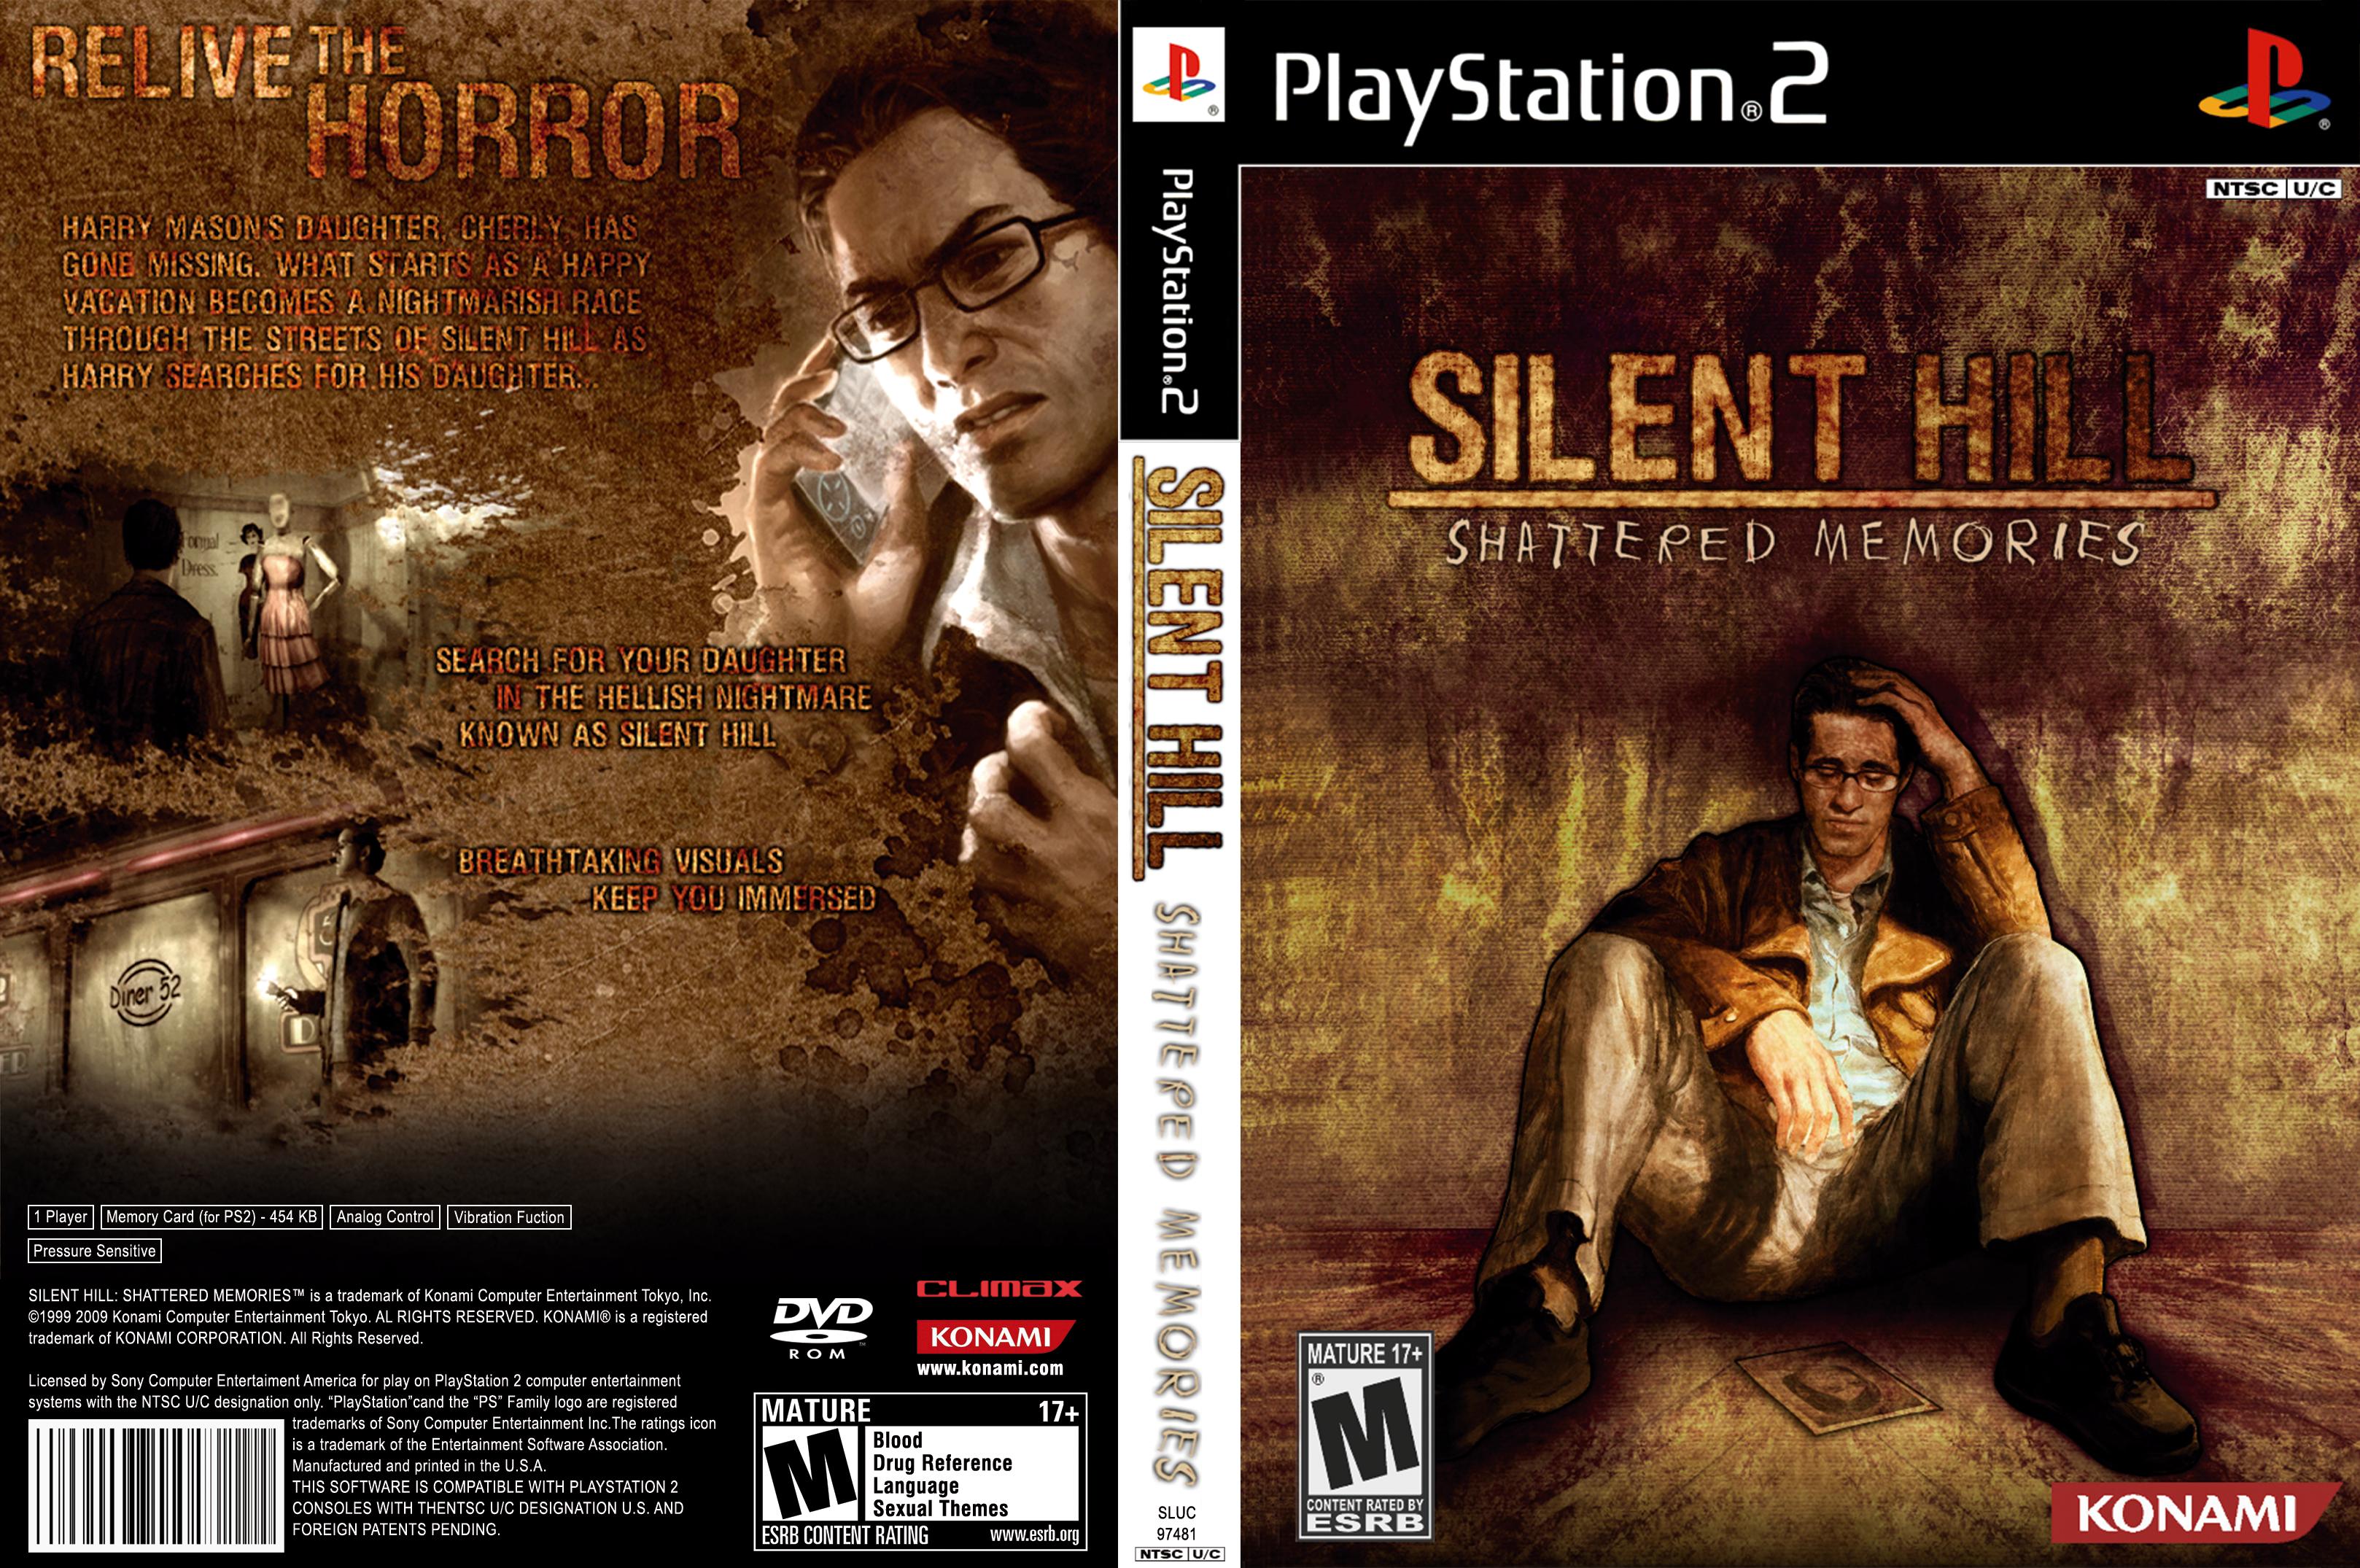 Silent Hill Shattered Memories Ps2 Cover Art Silent Hill Cover Art Box Art